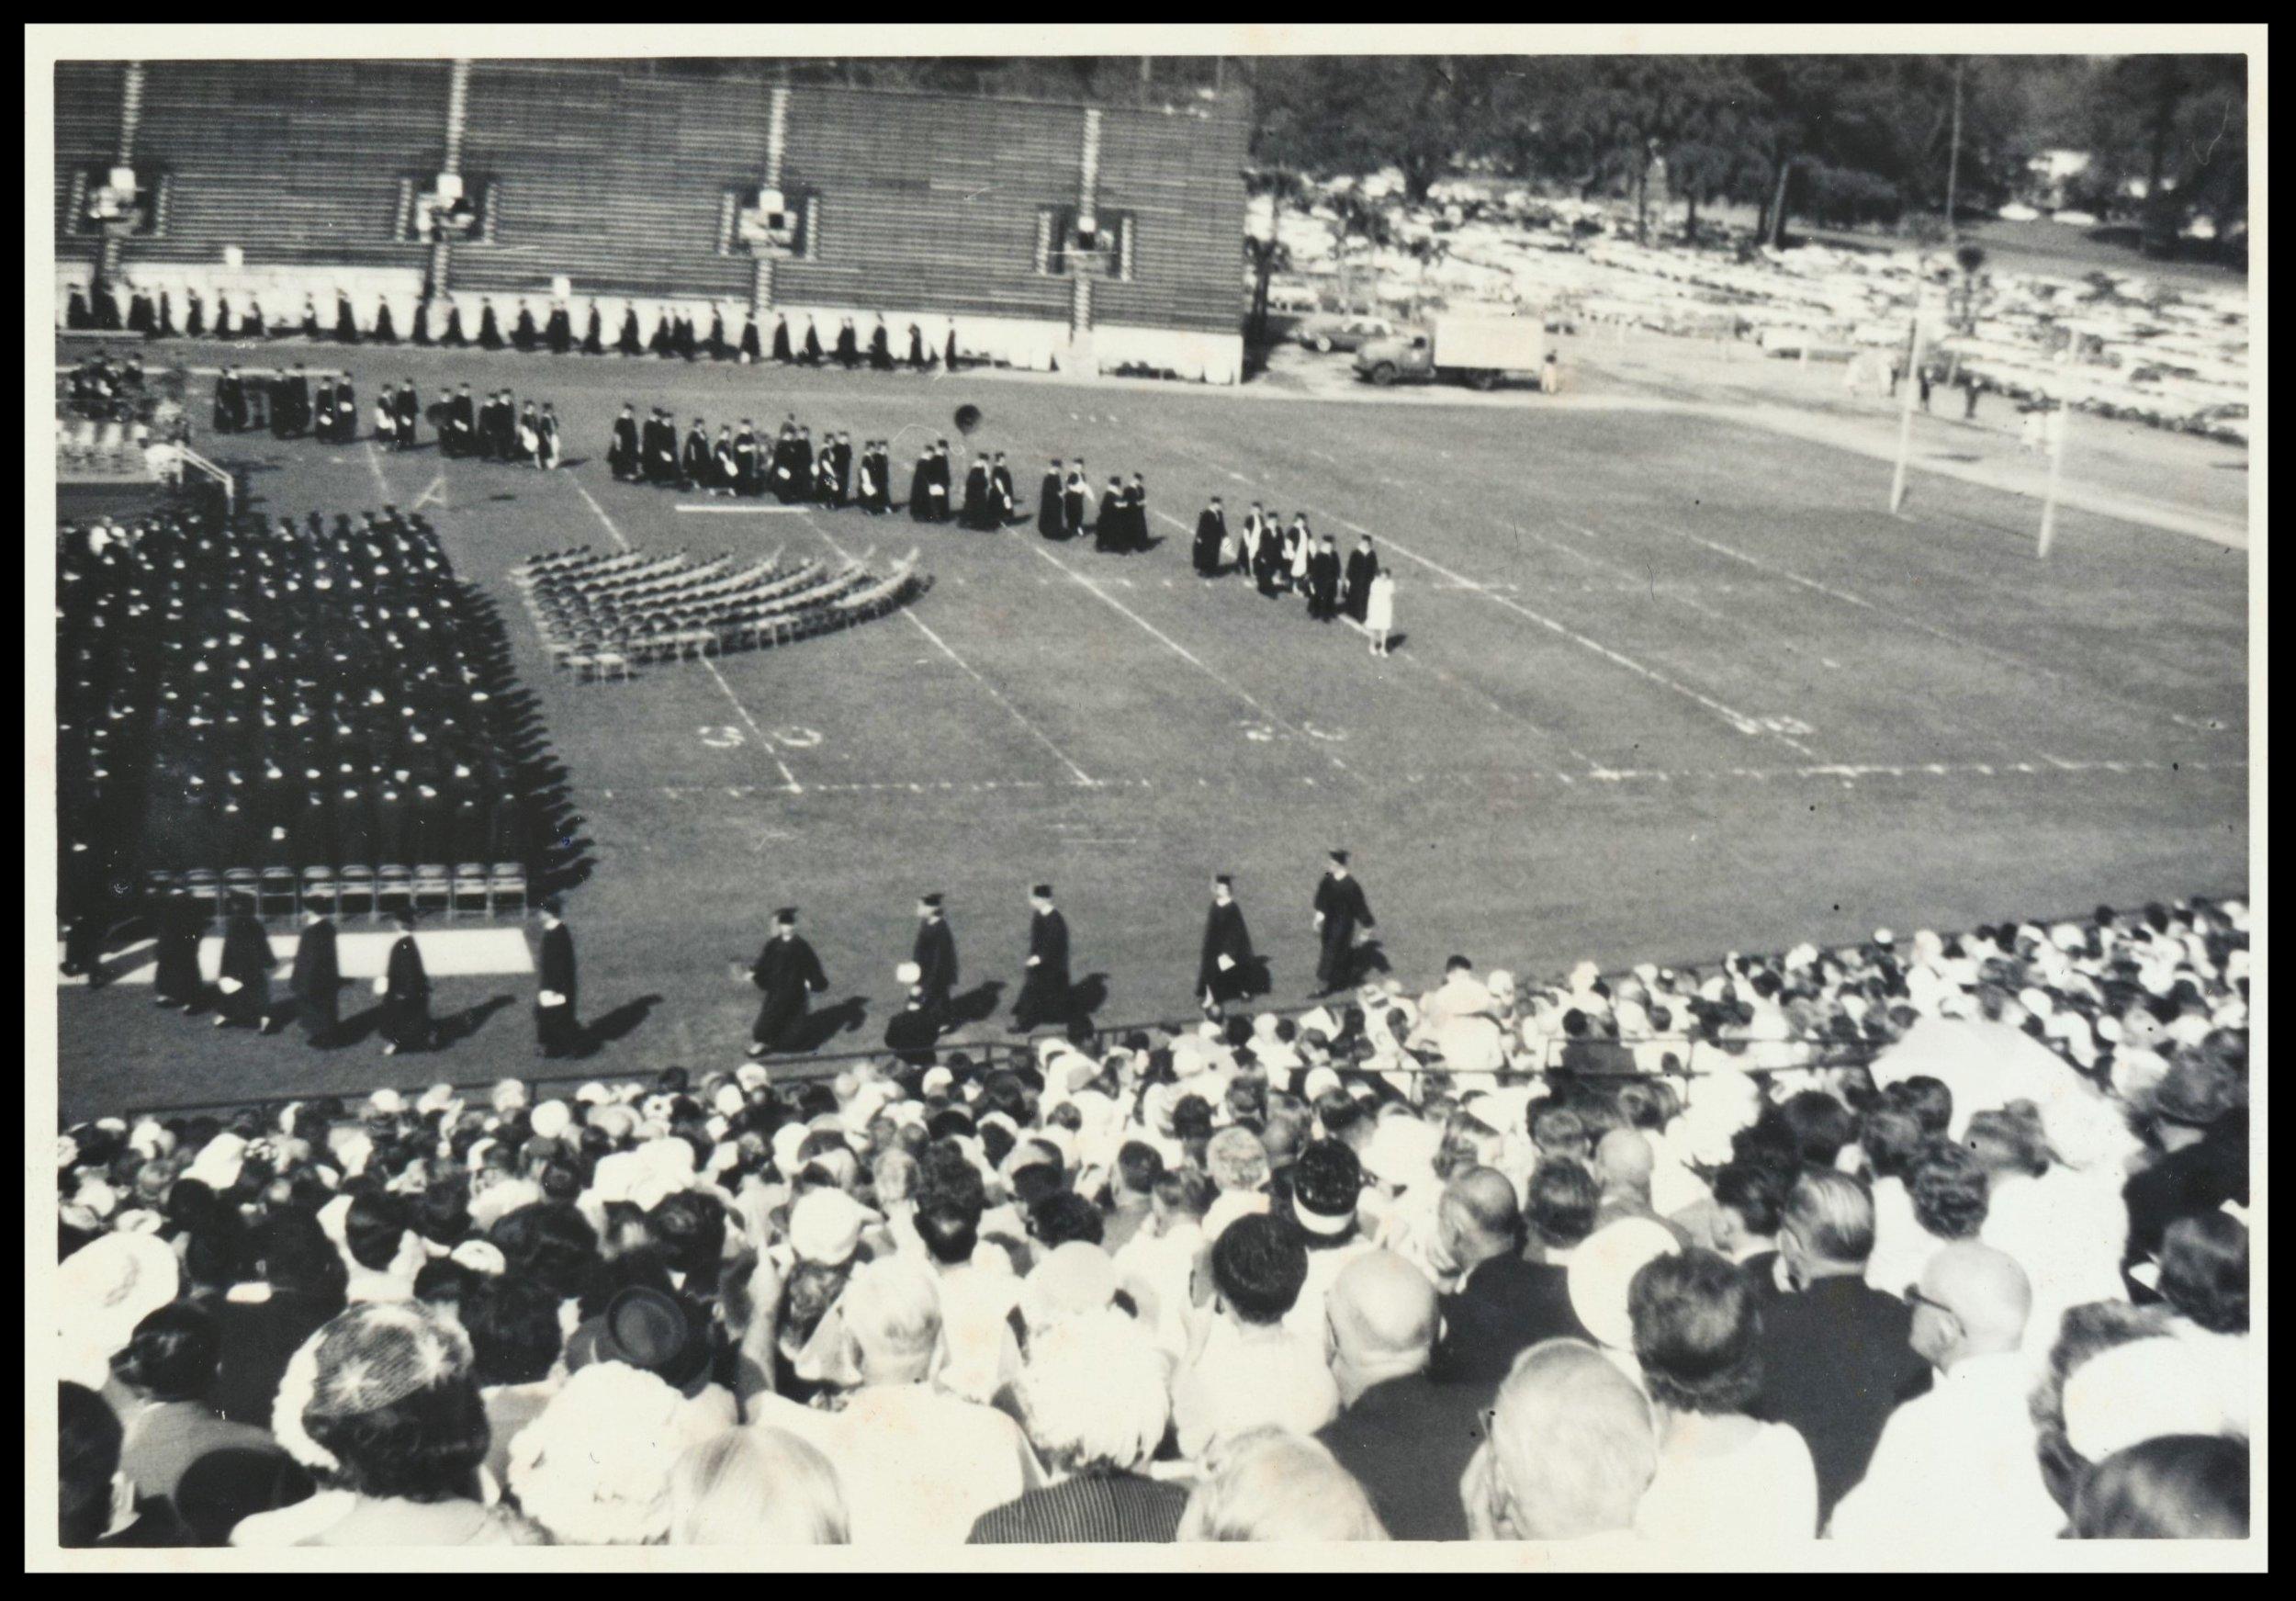 Dr. Young's FSU Graduation Ceremony